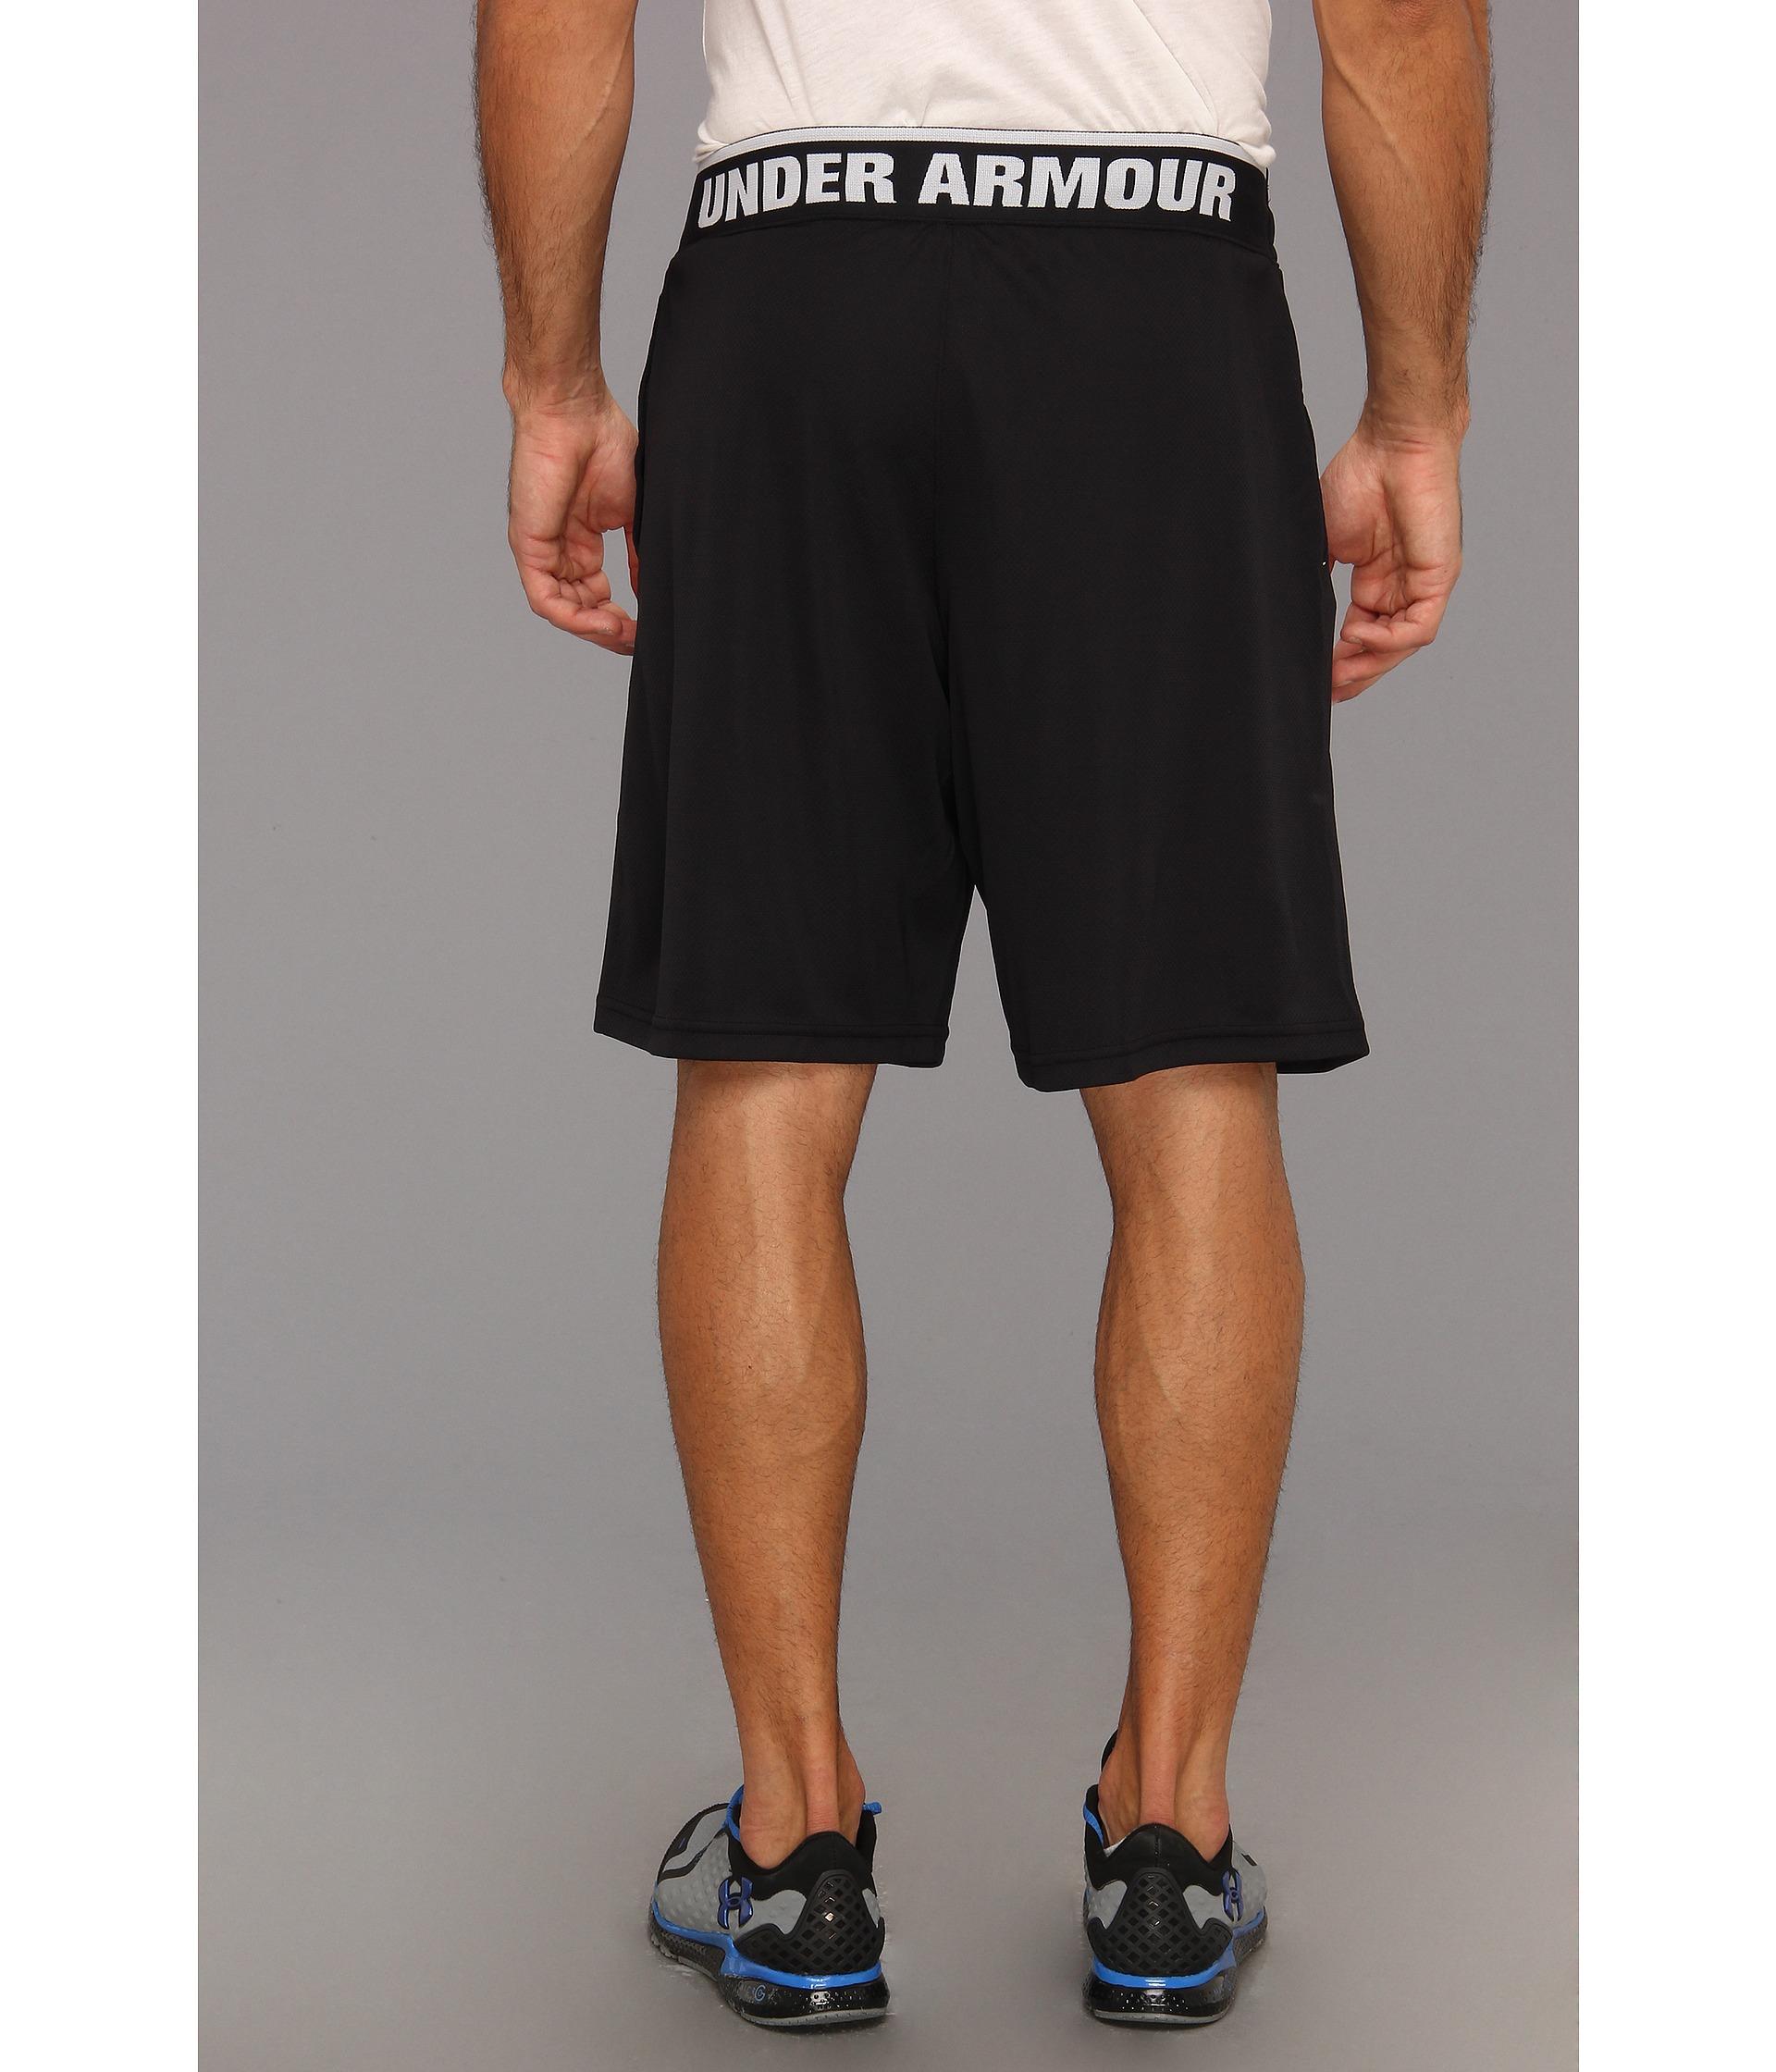 Lyst - Under Armour Heatgear® Reflex Short 10